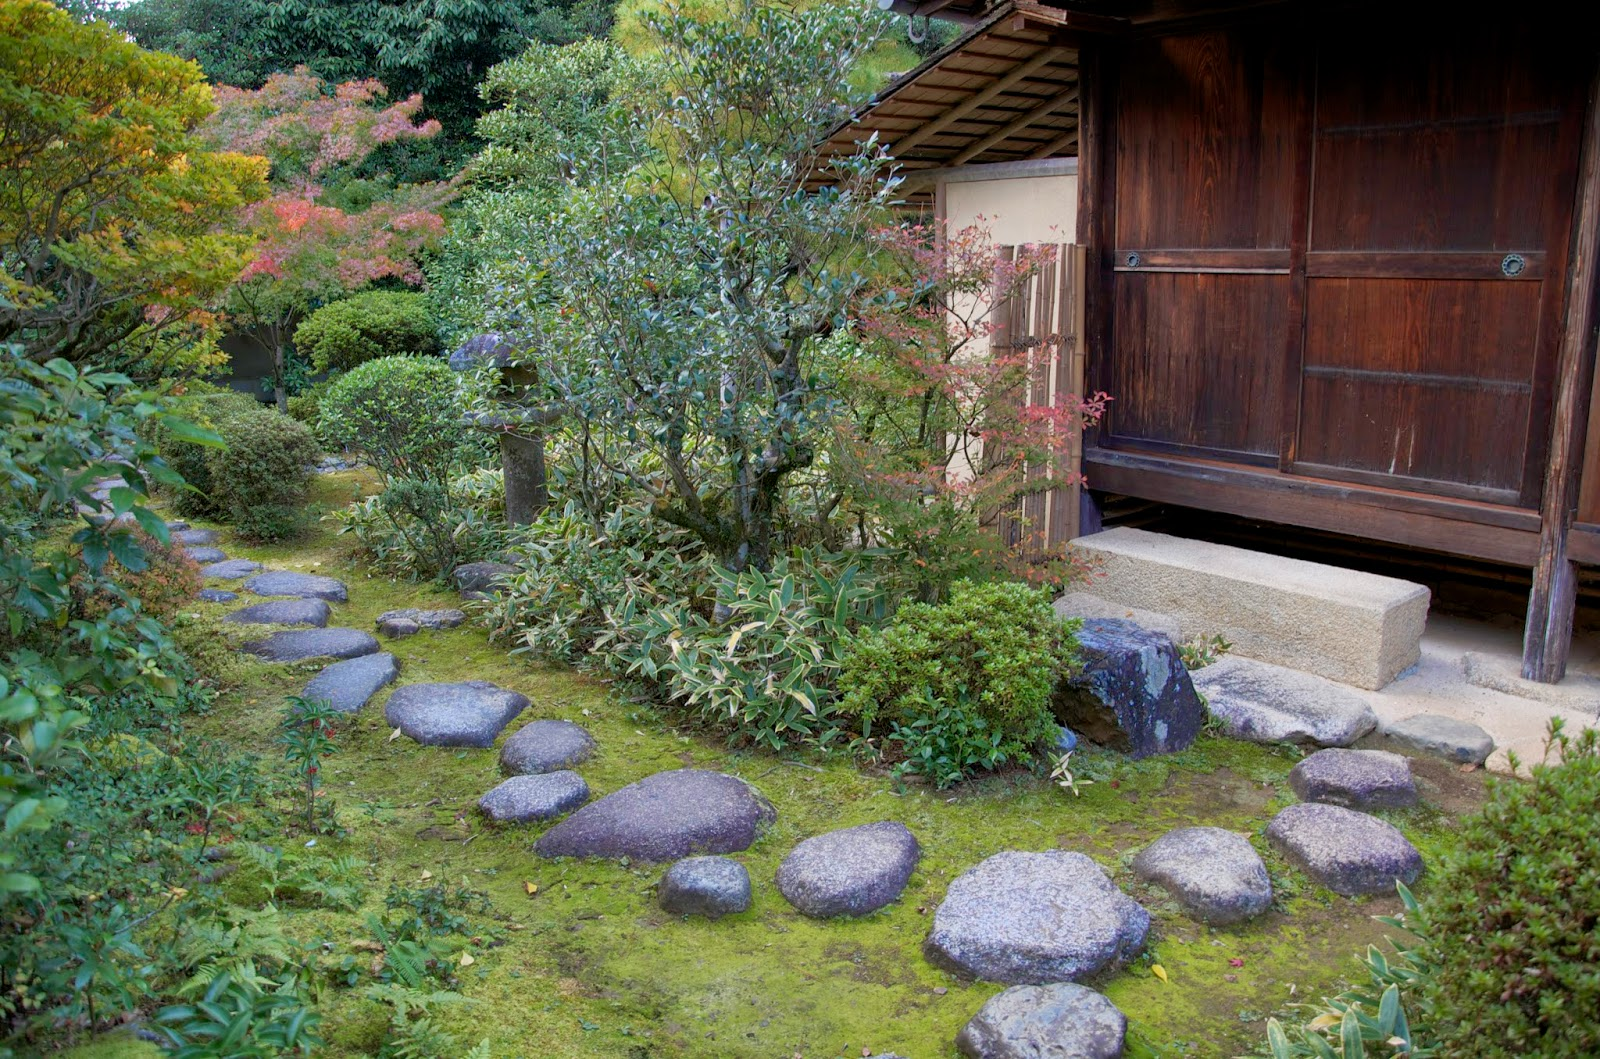 Robert Ketchell's blog: Stepping Stones in the Japanese Garden